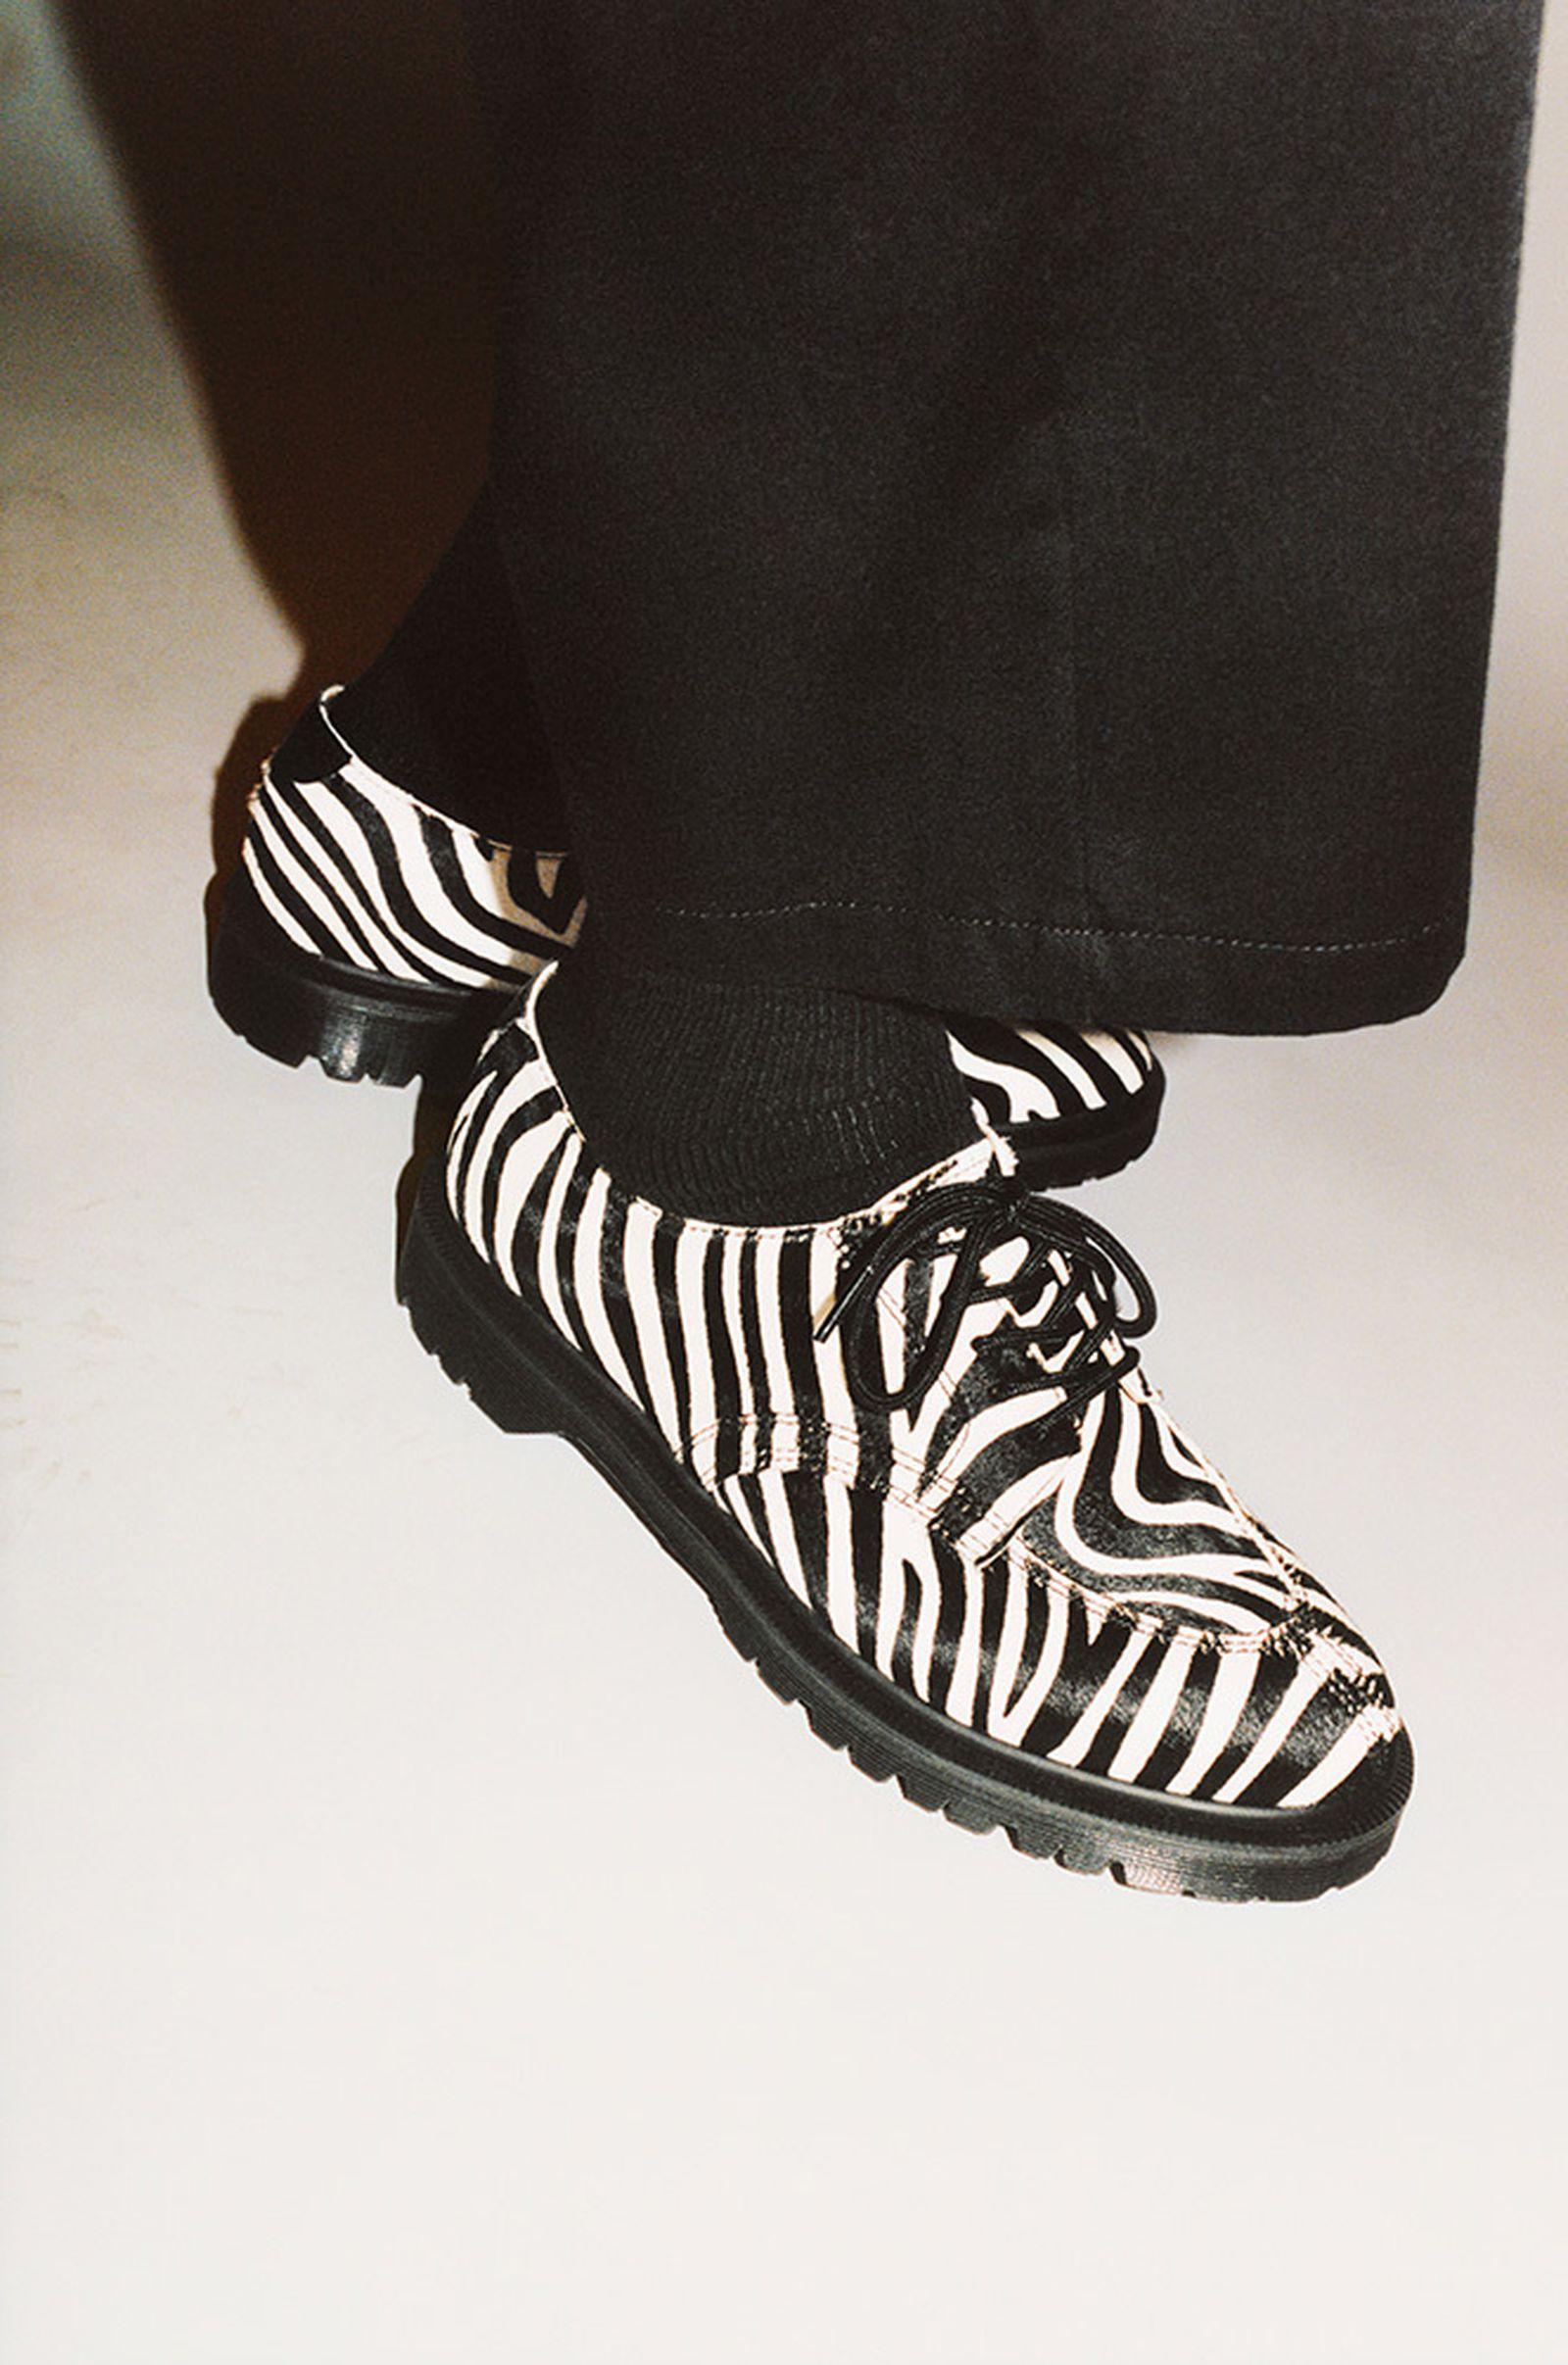 supreme-dr-martens-5-eye-shoe-release-date-price-01